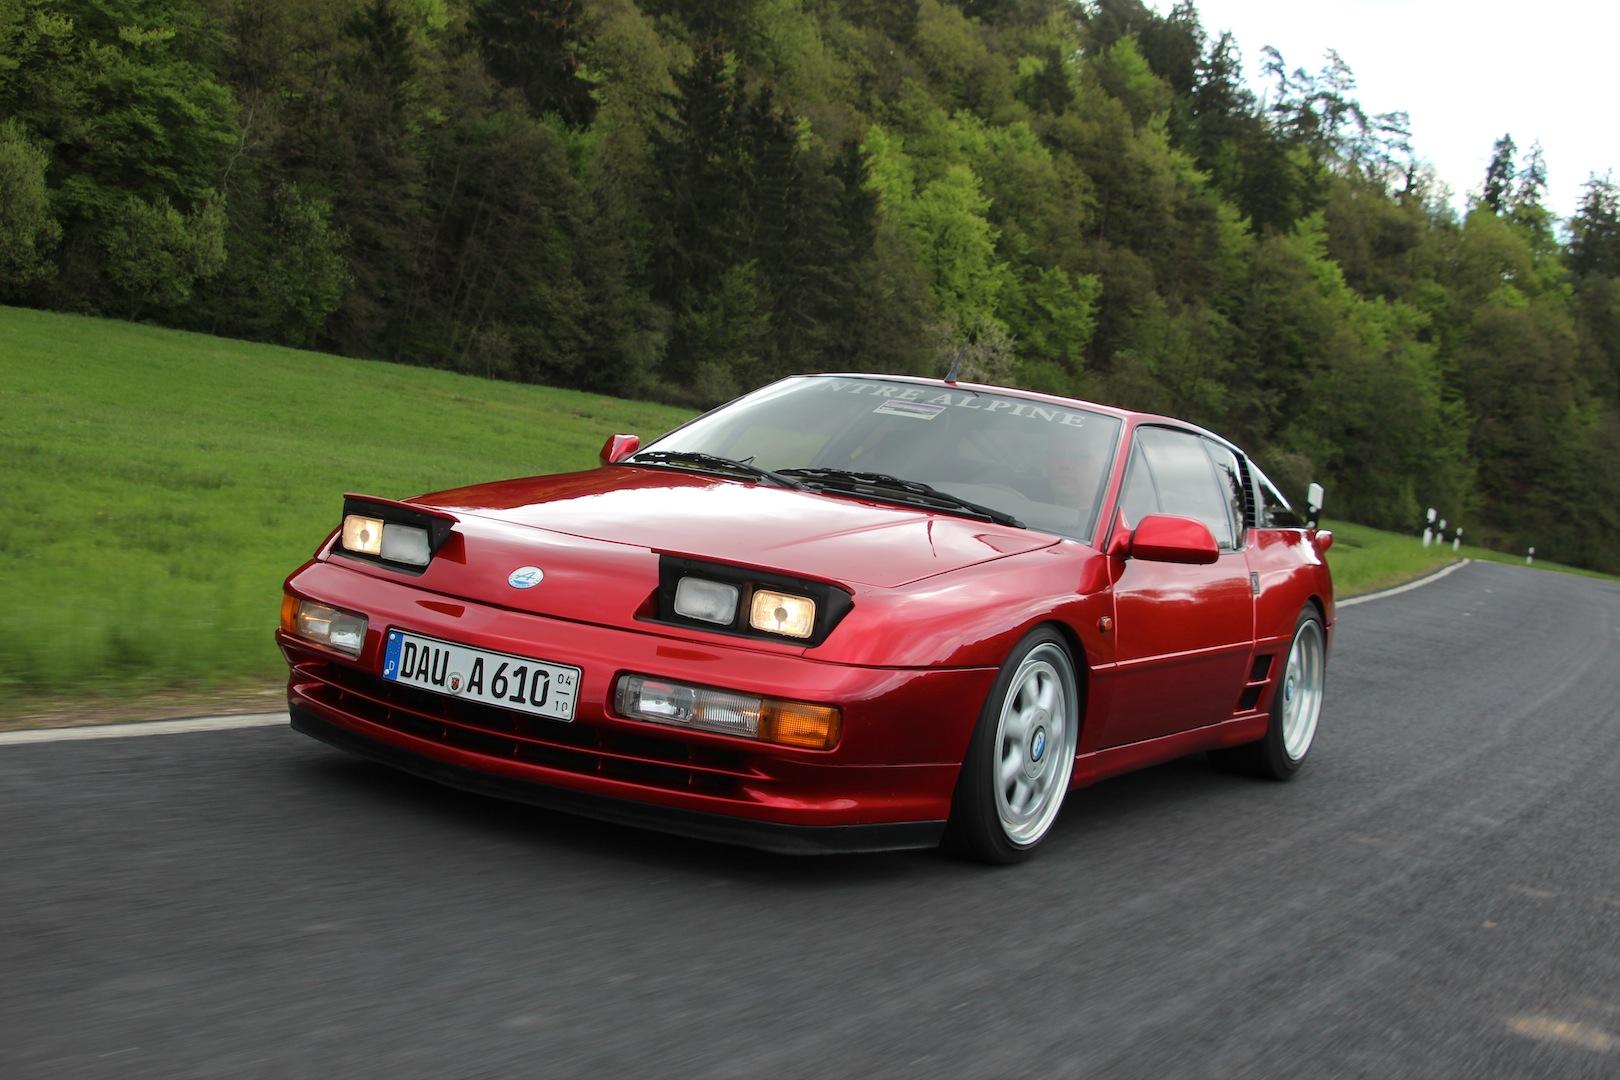 Renault Alpine A610 1991 2 Alpine A610 – Exclusividade francesa